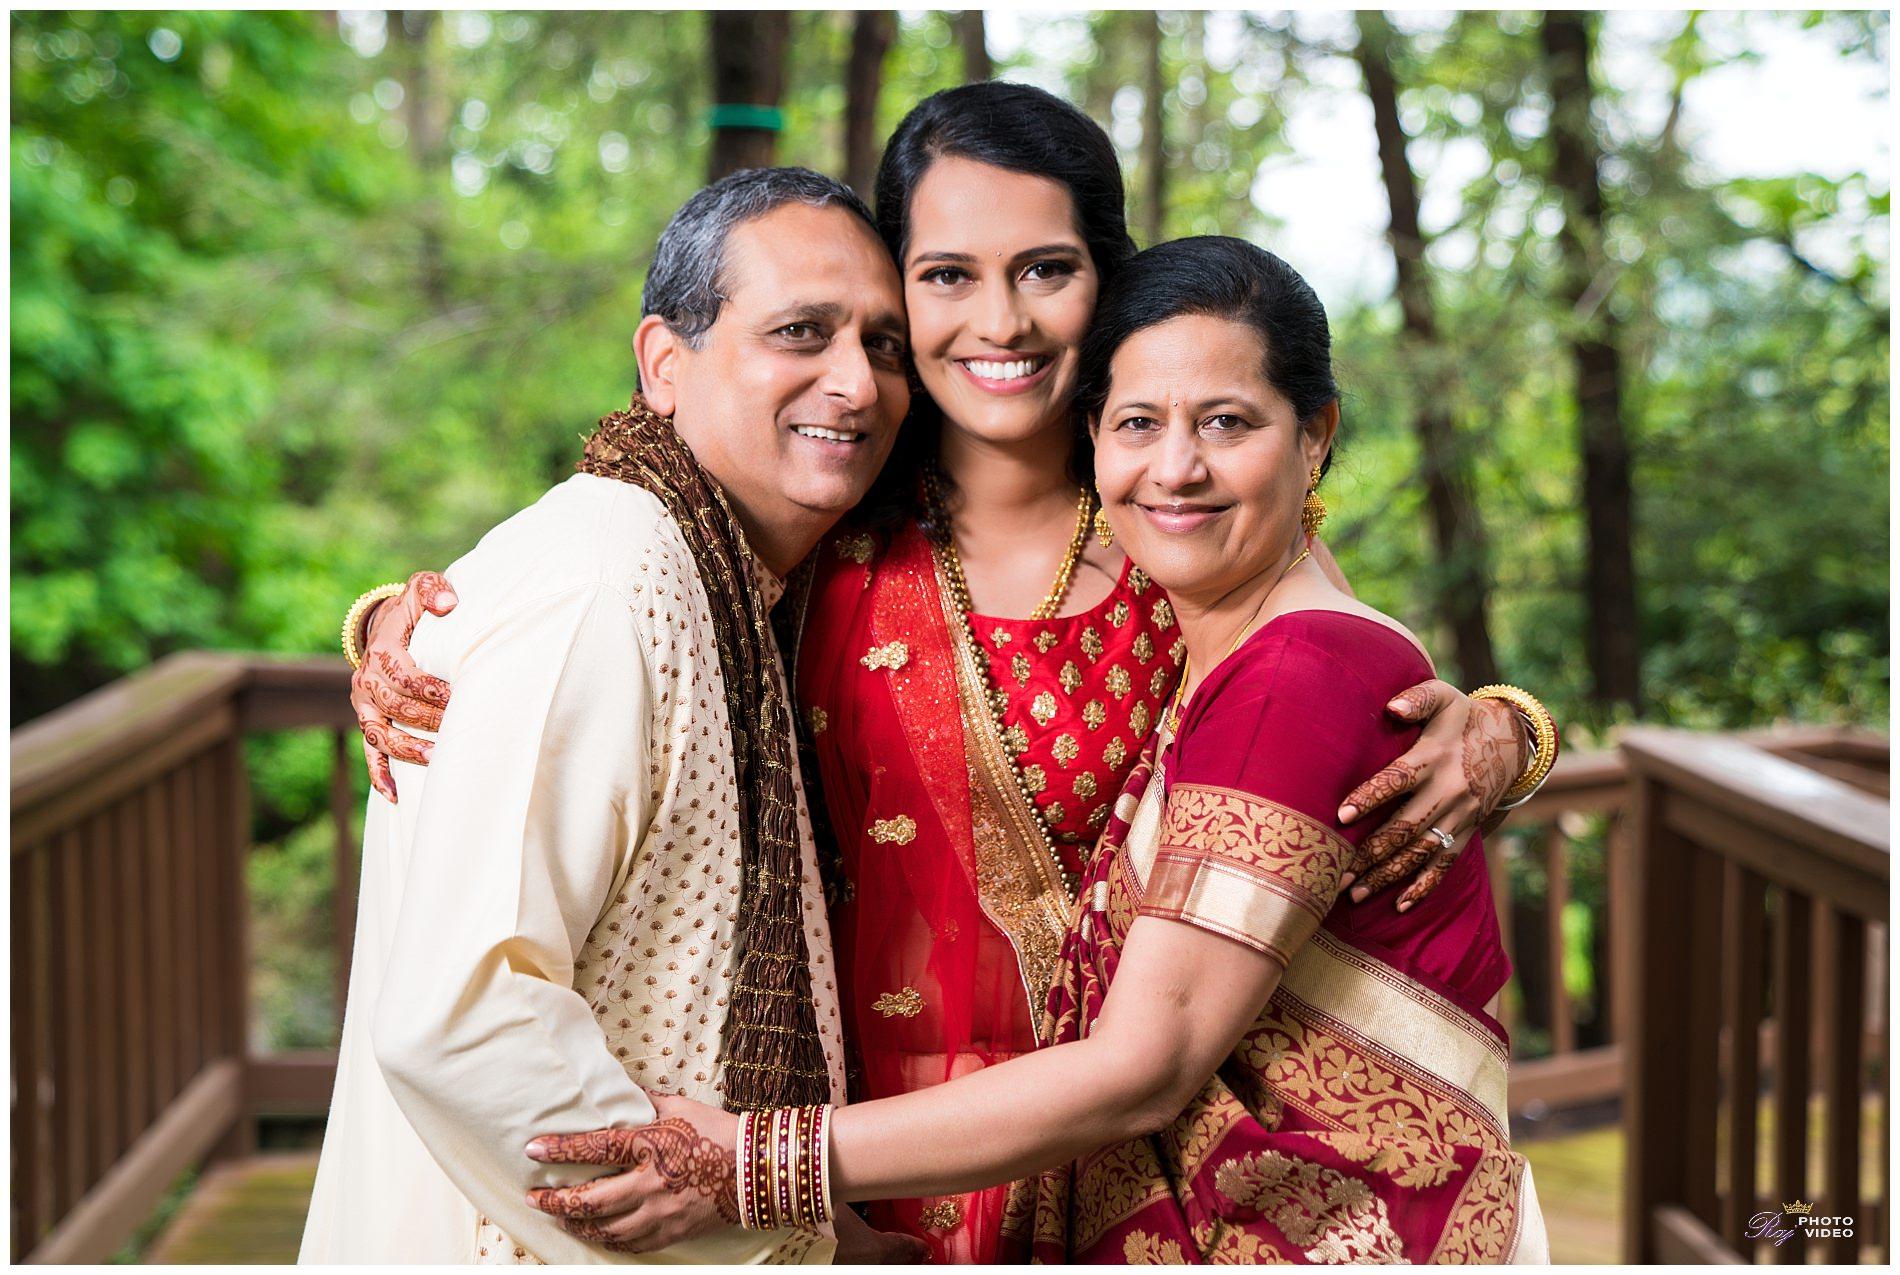 Martinsville-Gardens-NJ-Indian-Wedding-Ruchi-Vishal-7.jpg